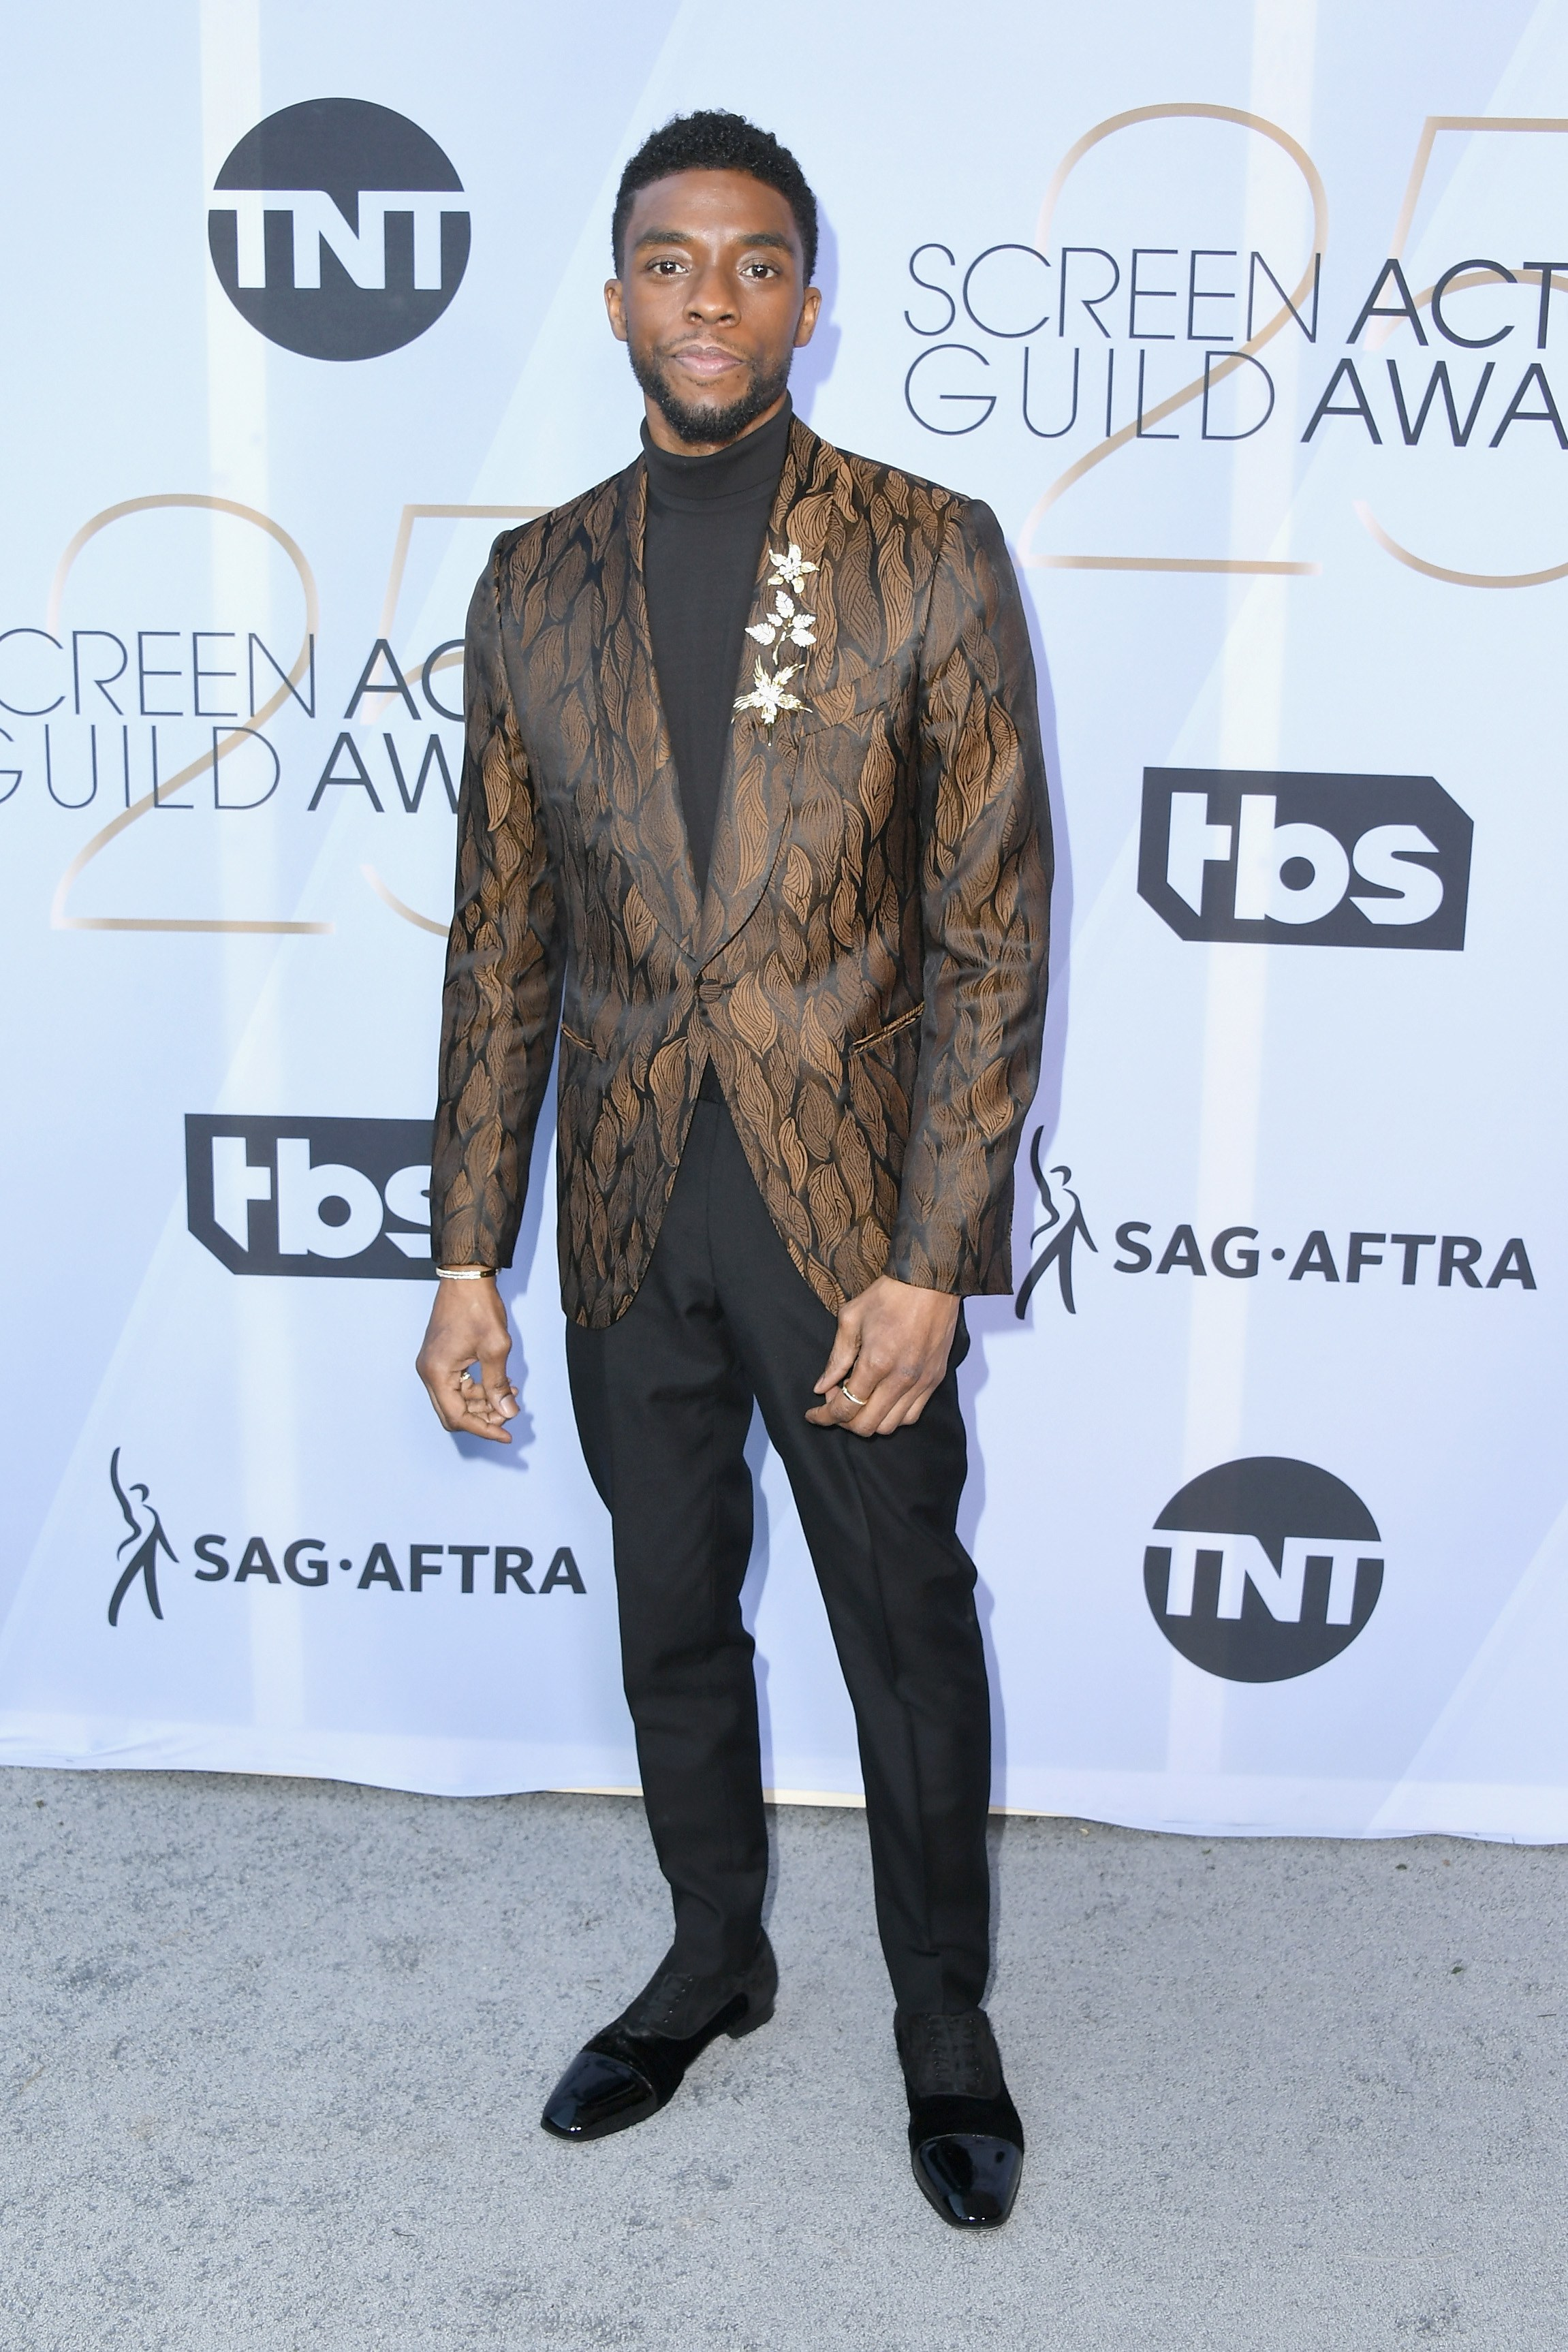 - Chadwick Boseman in Ermenegildo Zegna XXX, Christian Louboutin shoes, and Tiffany & Co. jewelry